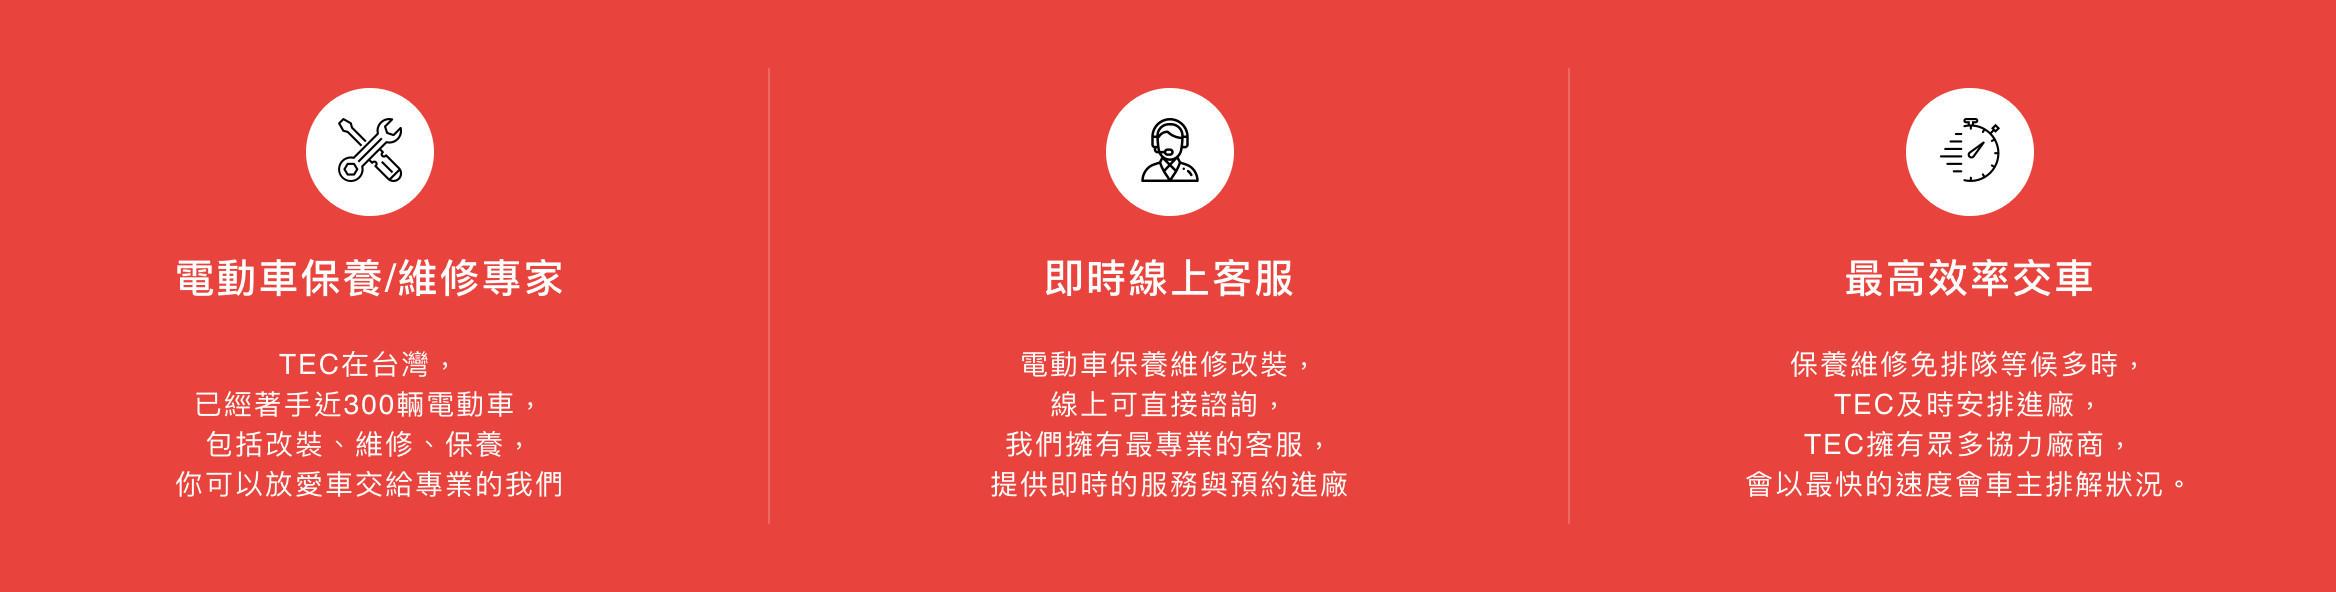 TEC-TESLA EQUIPMENT CENTER 台灣電動車保養改裝廠網站風格